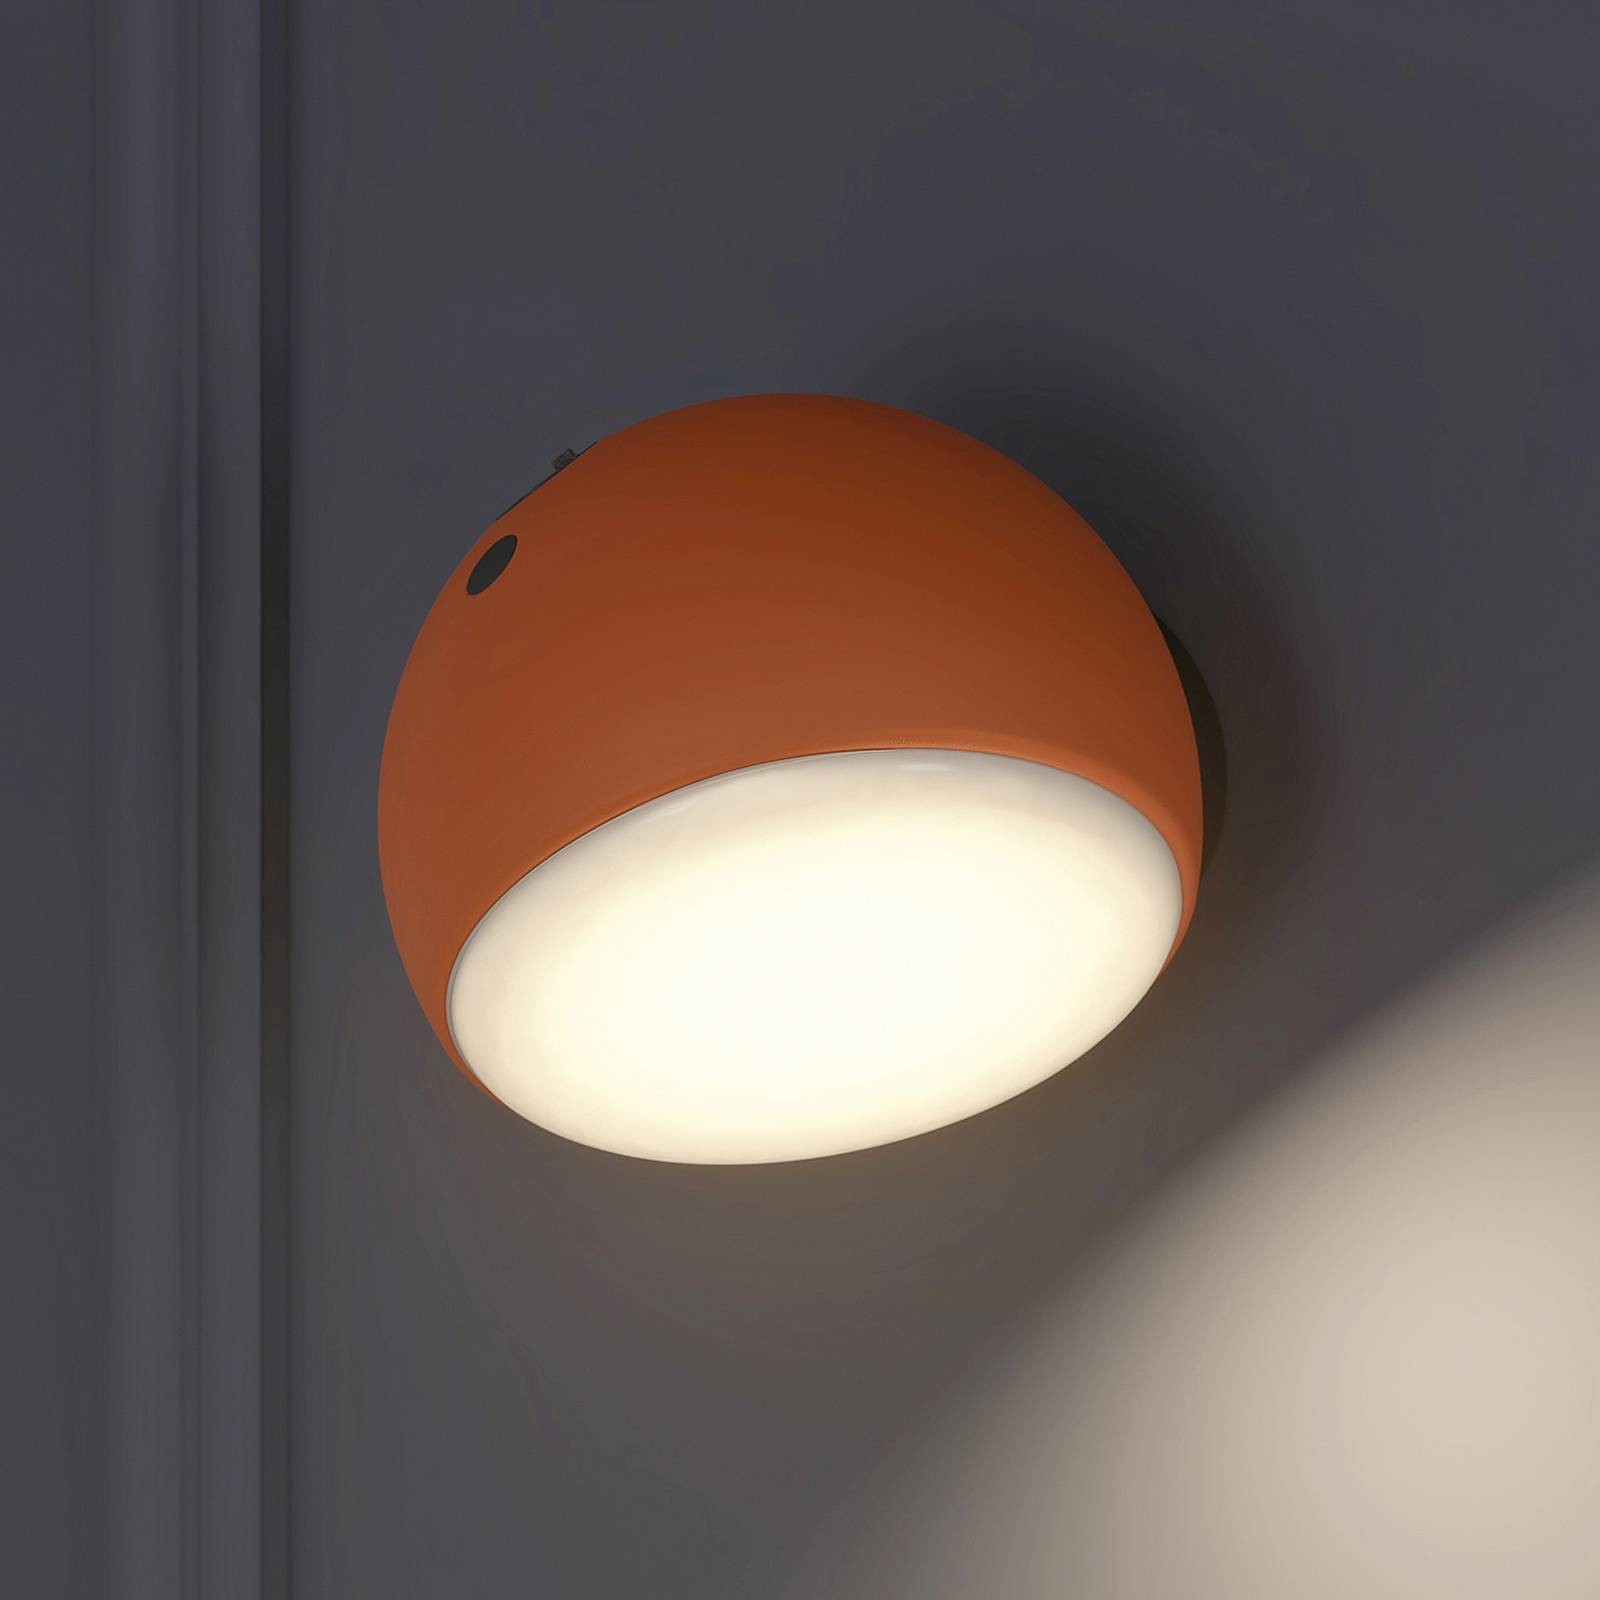 Arcchio Davir -LED-seinävalaisin, akku, orange